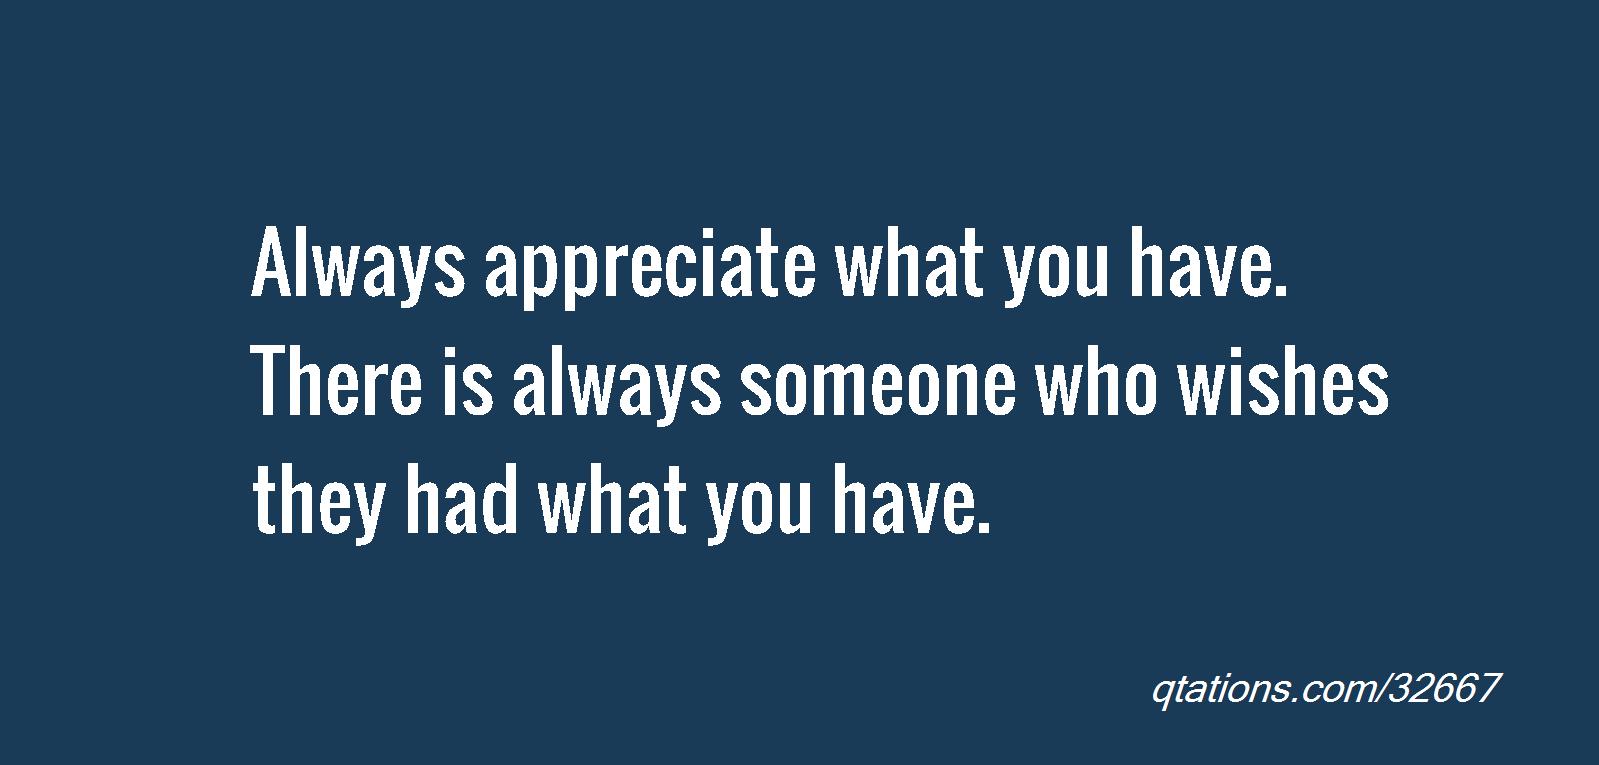 Appreciate What You Have Always Apprecia...